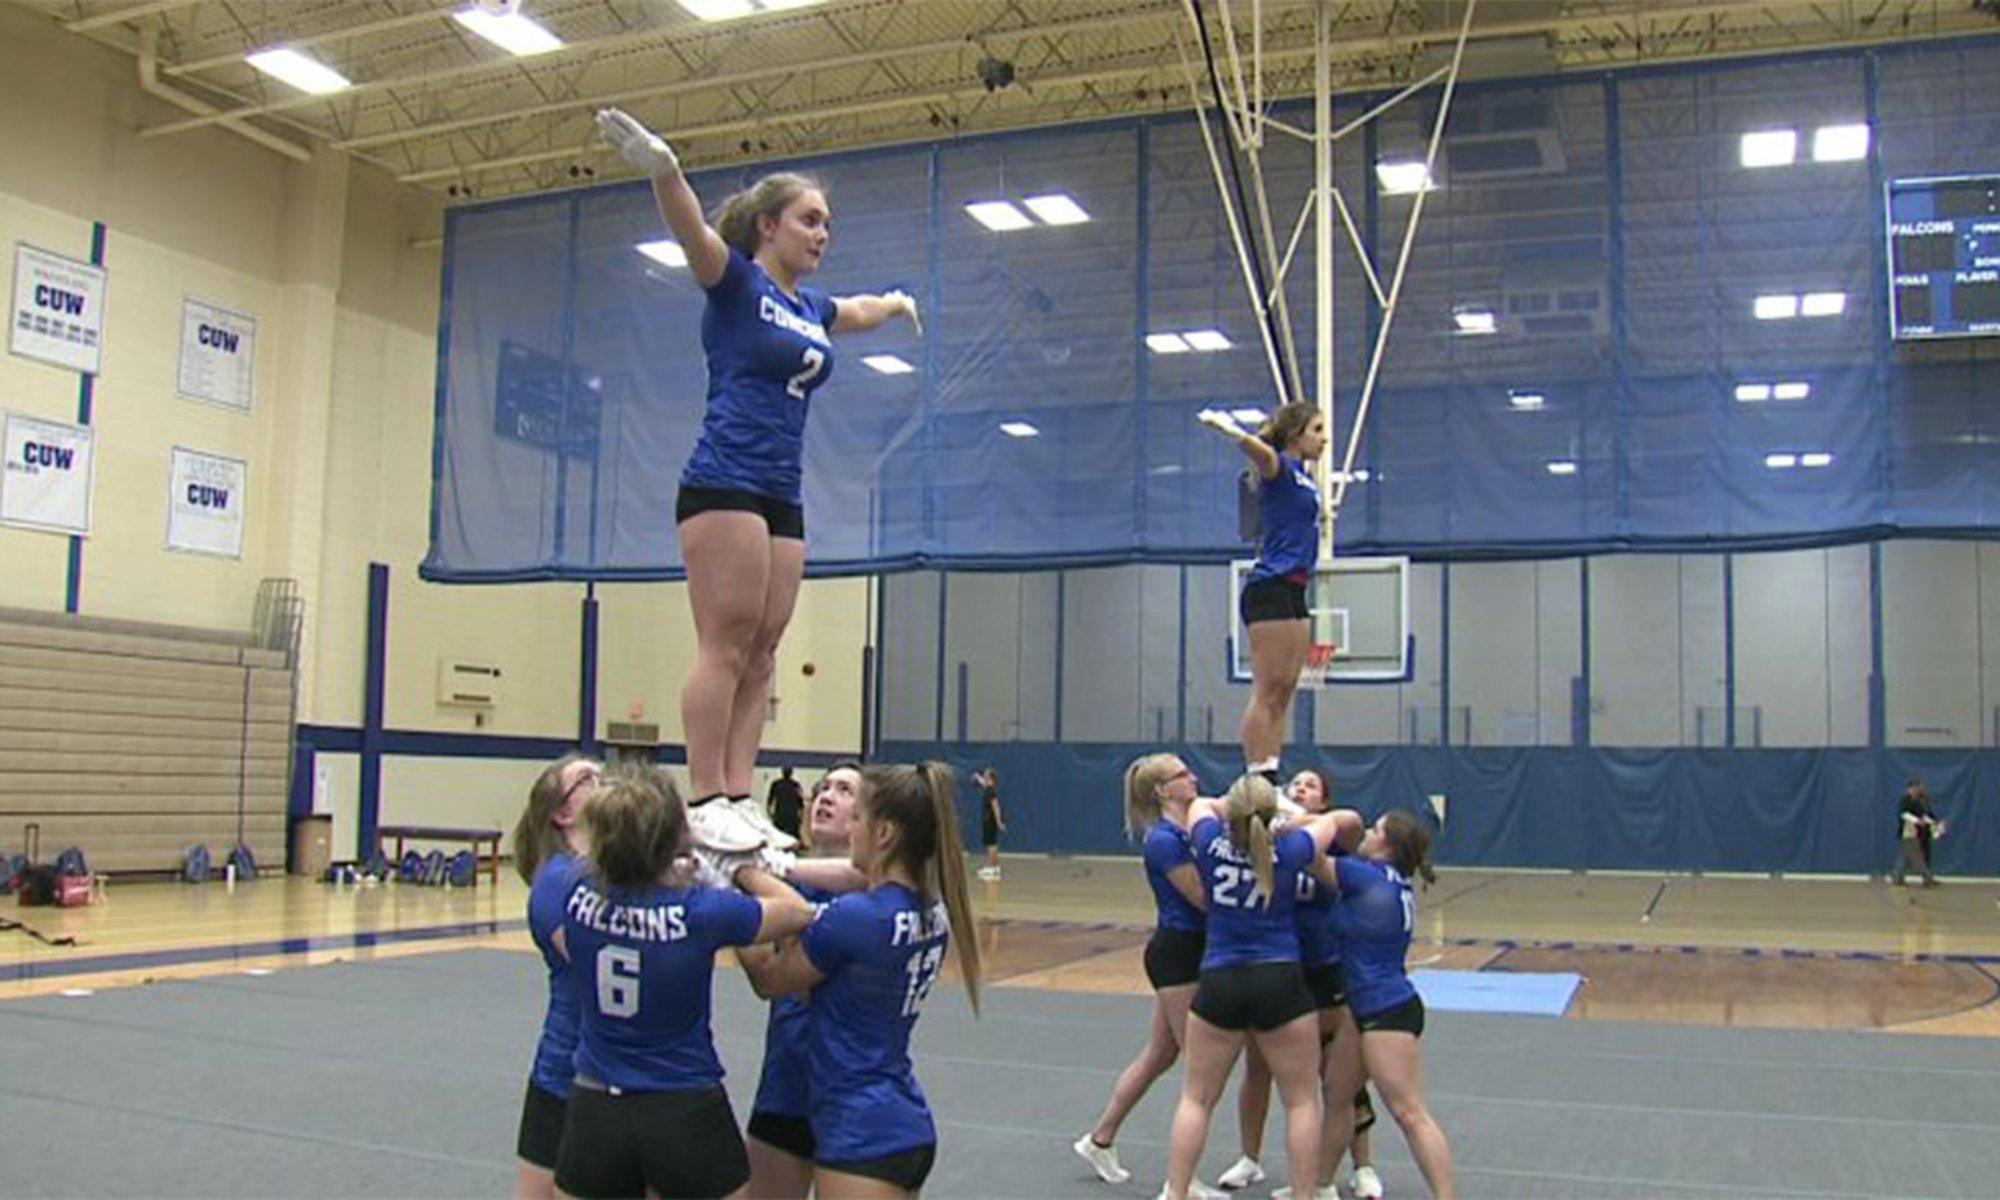 Acro-tumbling combines cheerleading, gymnastics; helps put Concordia University on the map